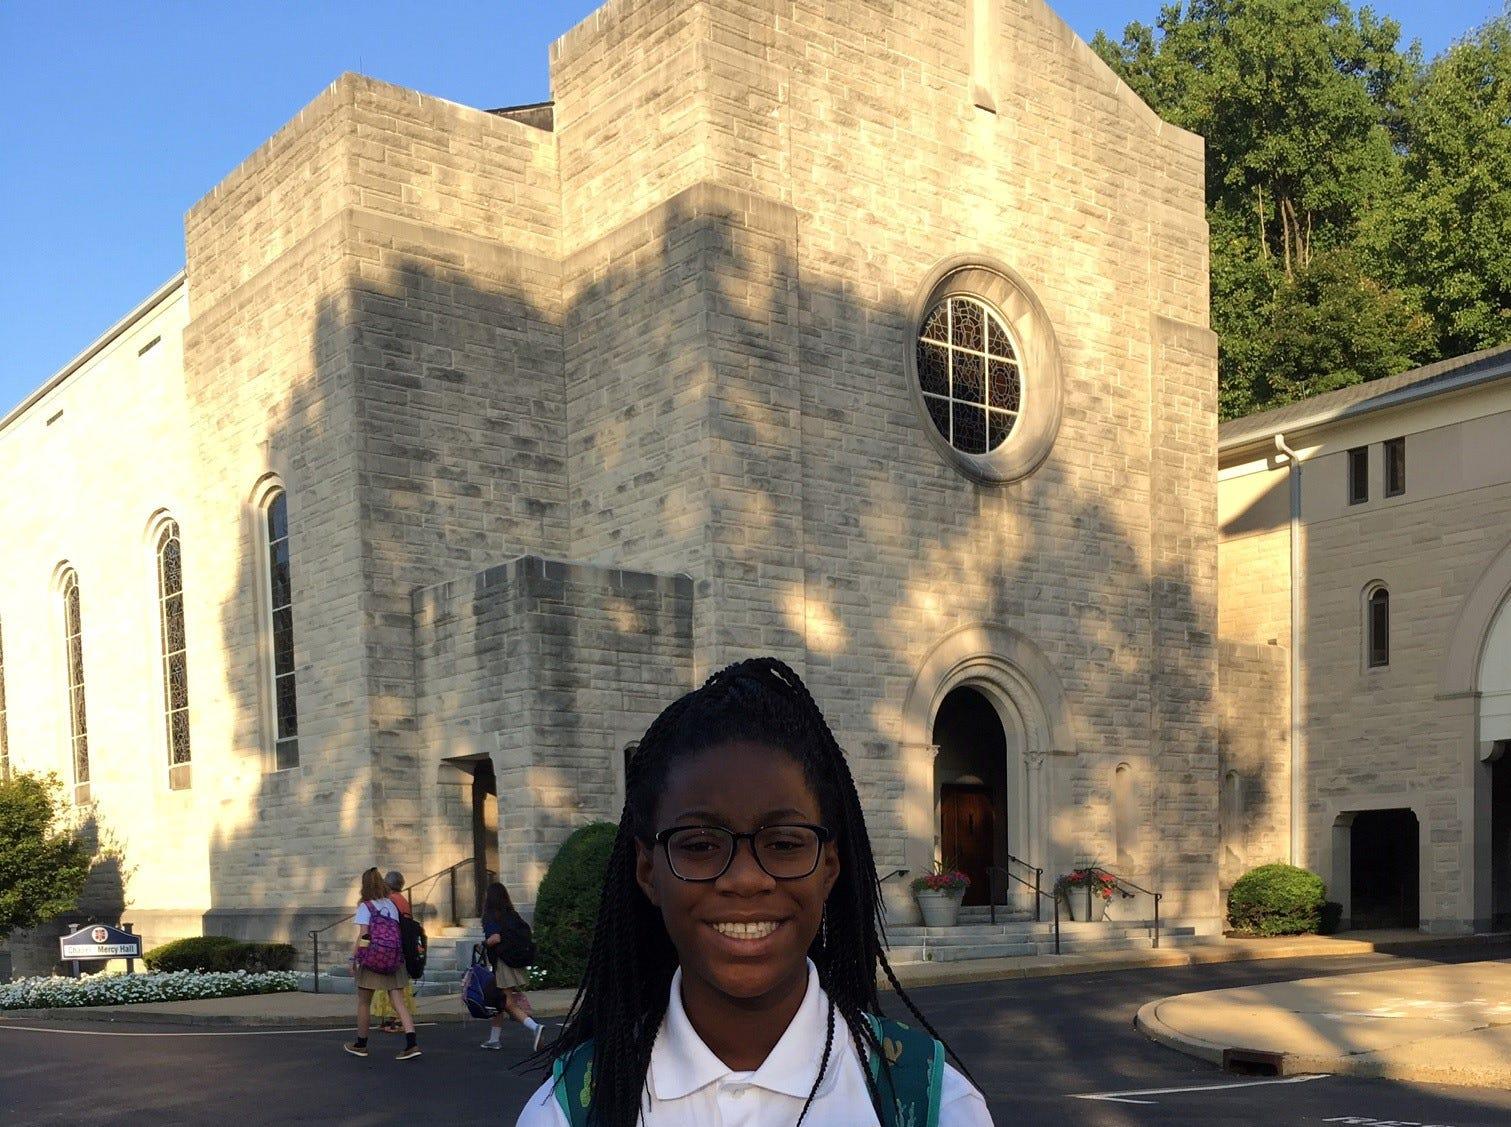 Gabriella Robinson of Piscataway earns Girl Scout silver award